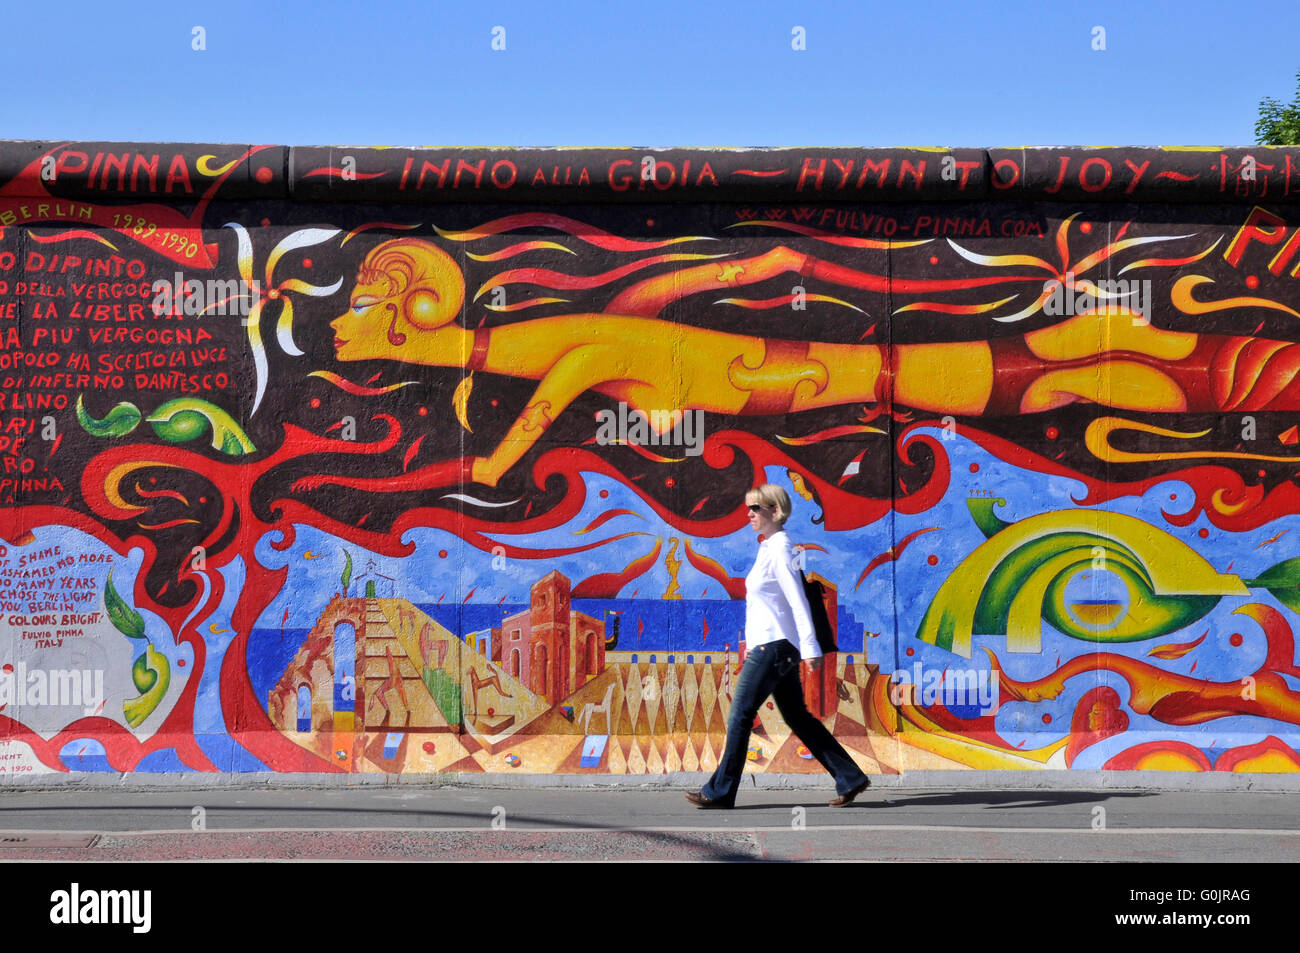 East side gallery wandmalerei malerei freiluftgalerie berliner mauer friedrichshain berlin - Wandmalerei berlin ...